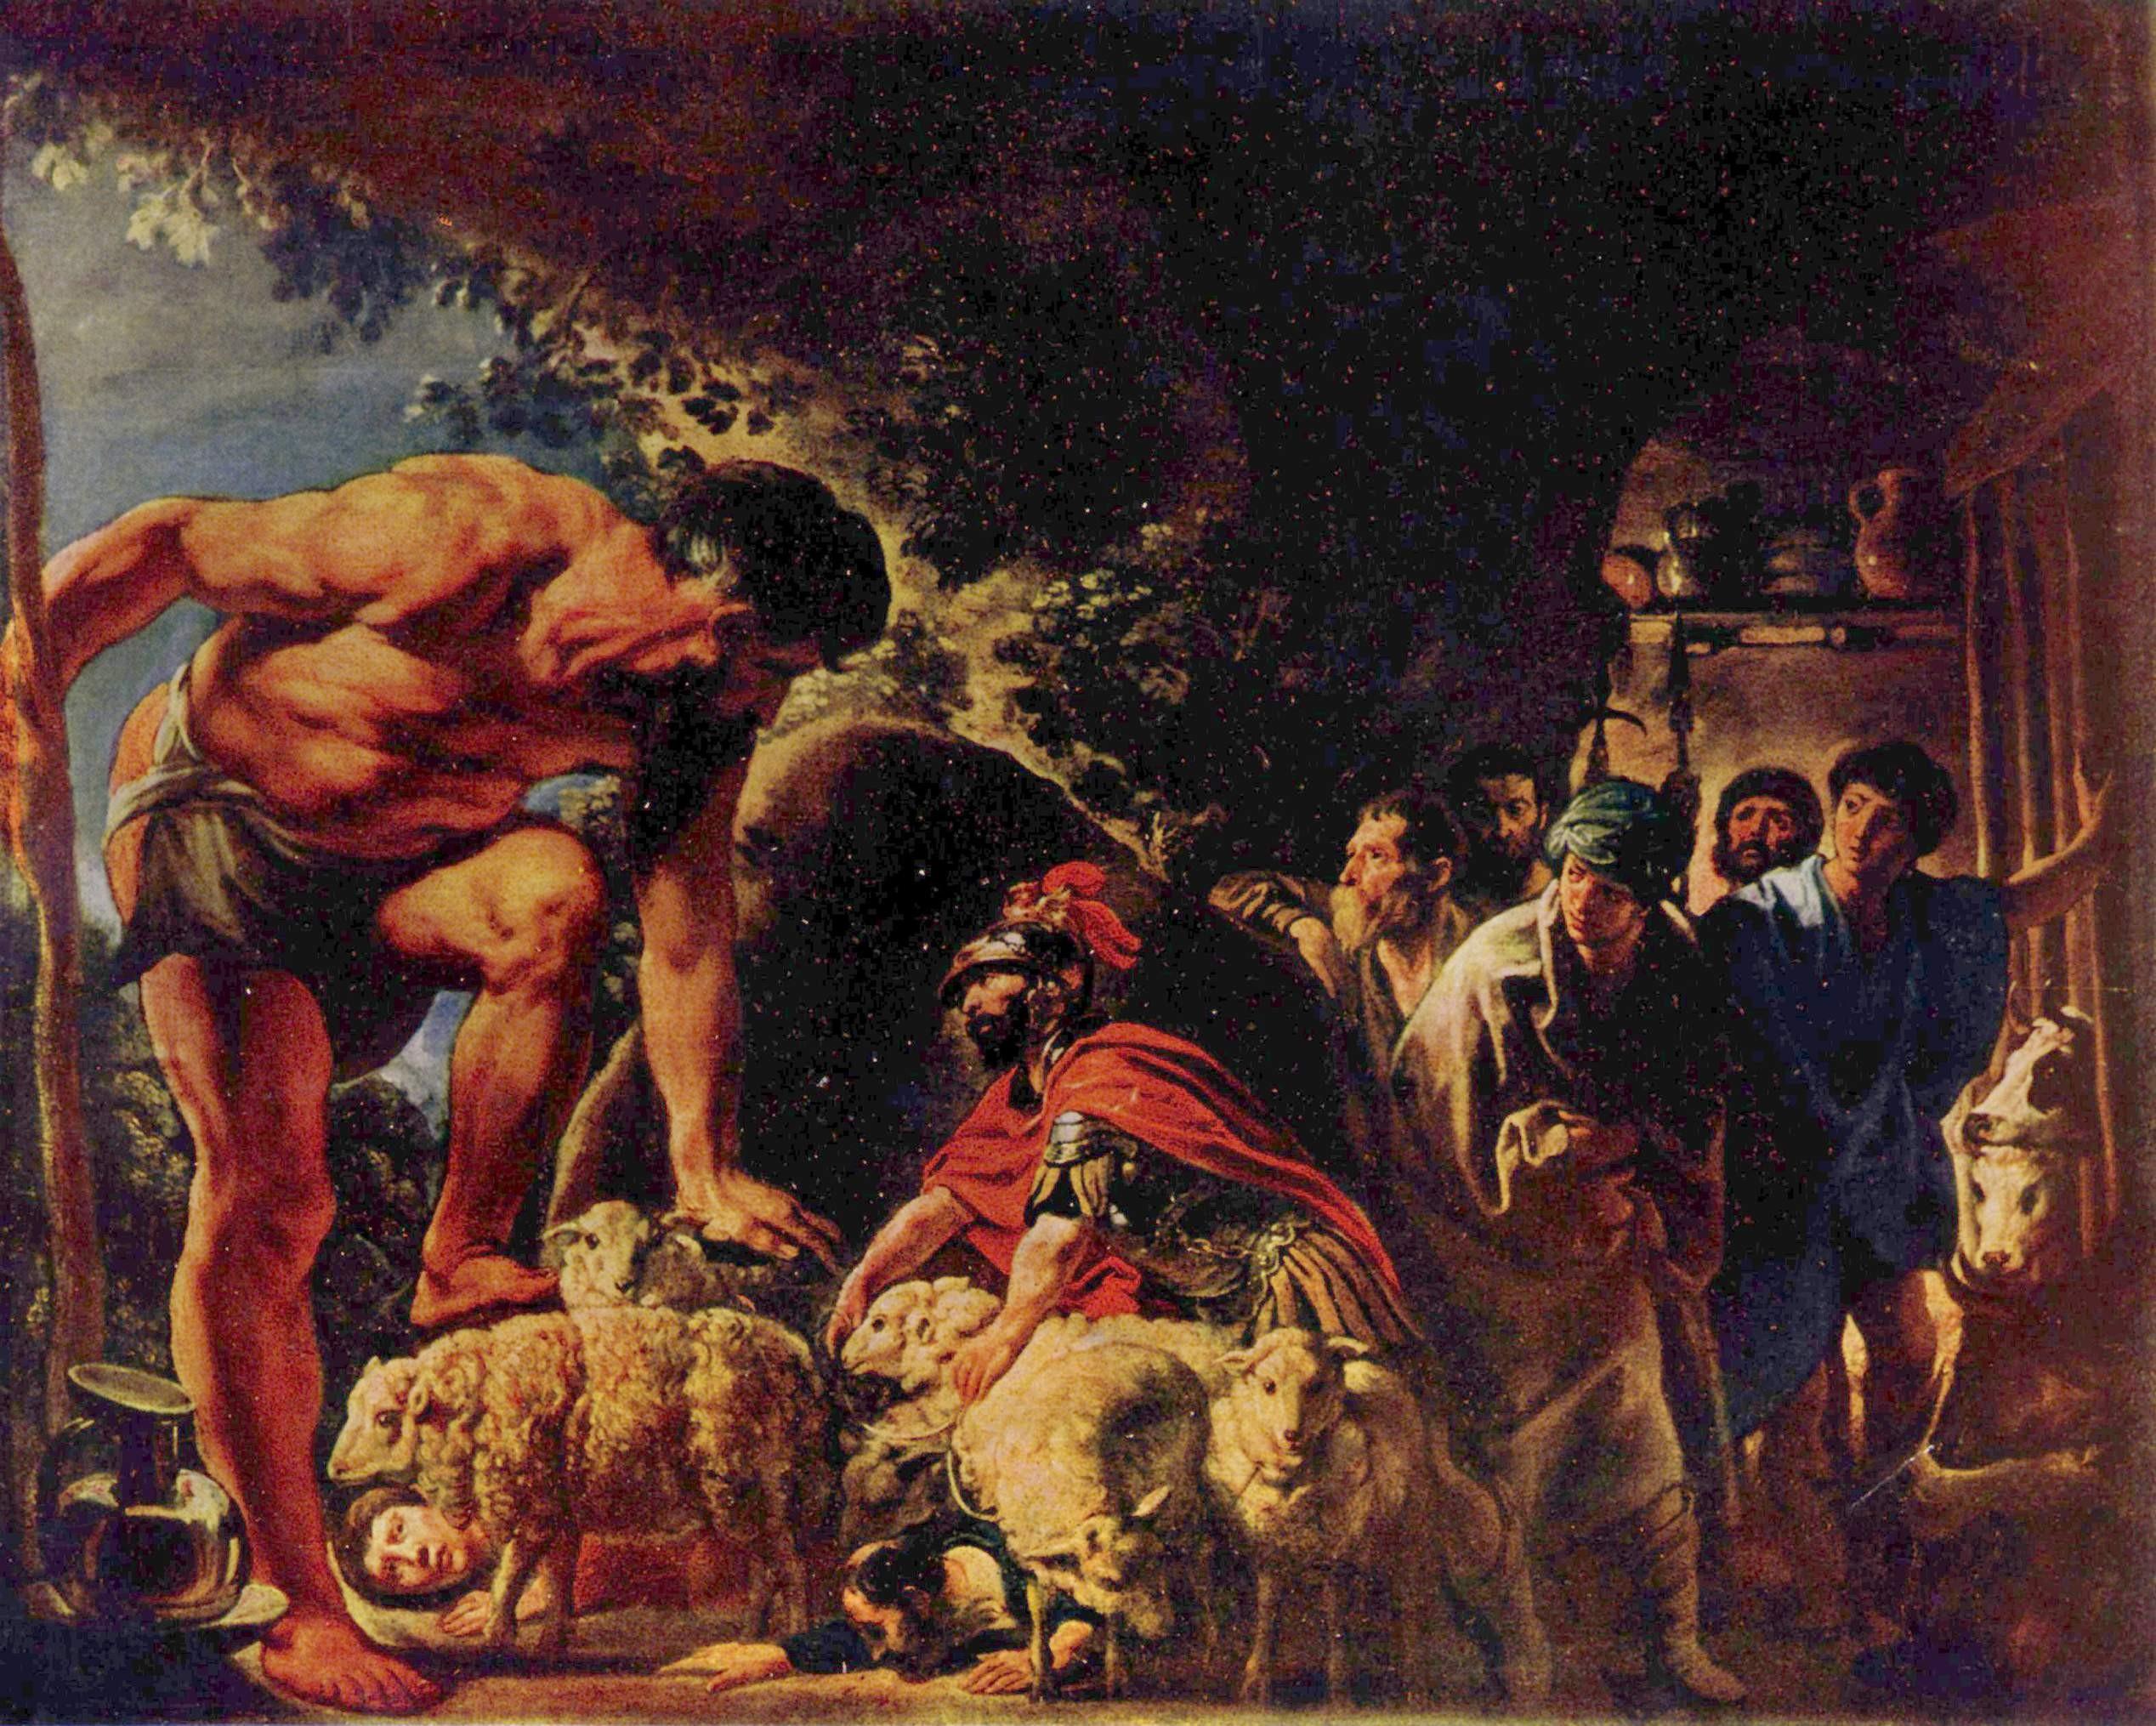 Sfondi La Pittura Opera D Arte Pittura Ad Olio Manifesto Mitologia Murale Odisseo Arte Arte Moderna Copertina Arazzo 2536x2030 Mxdp1 83853 Sfondi Gratis Wallhere